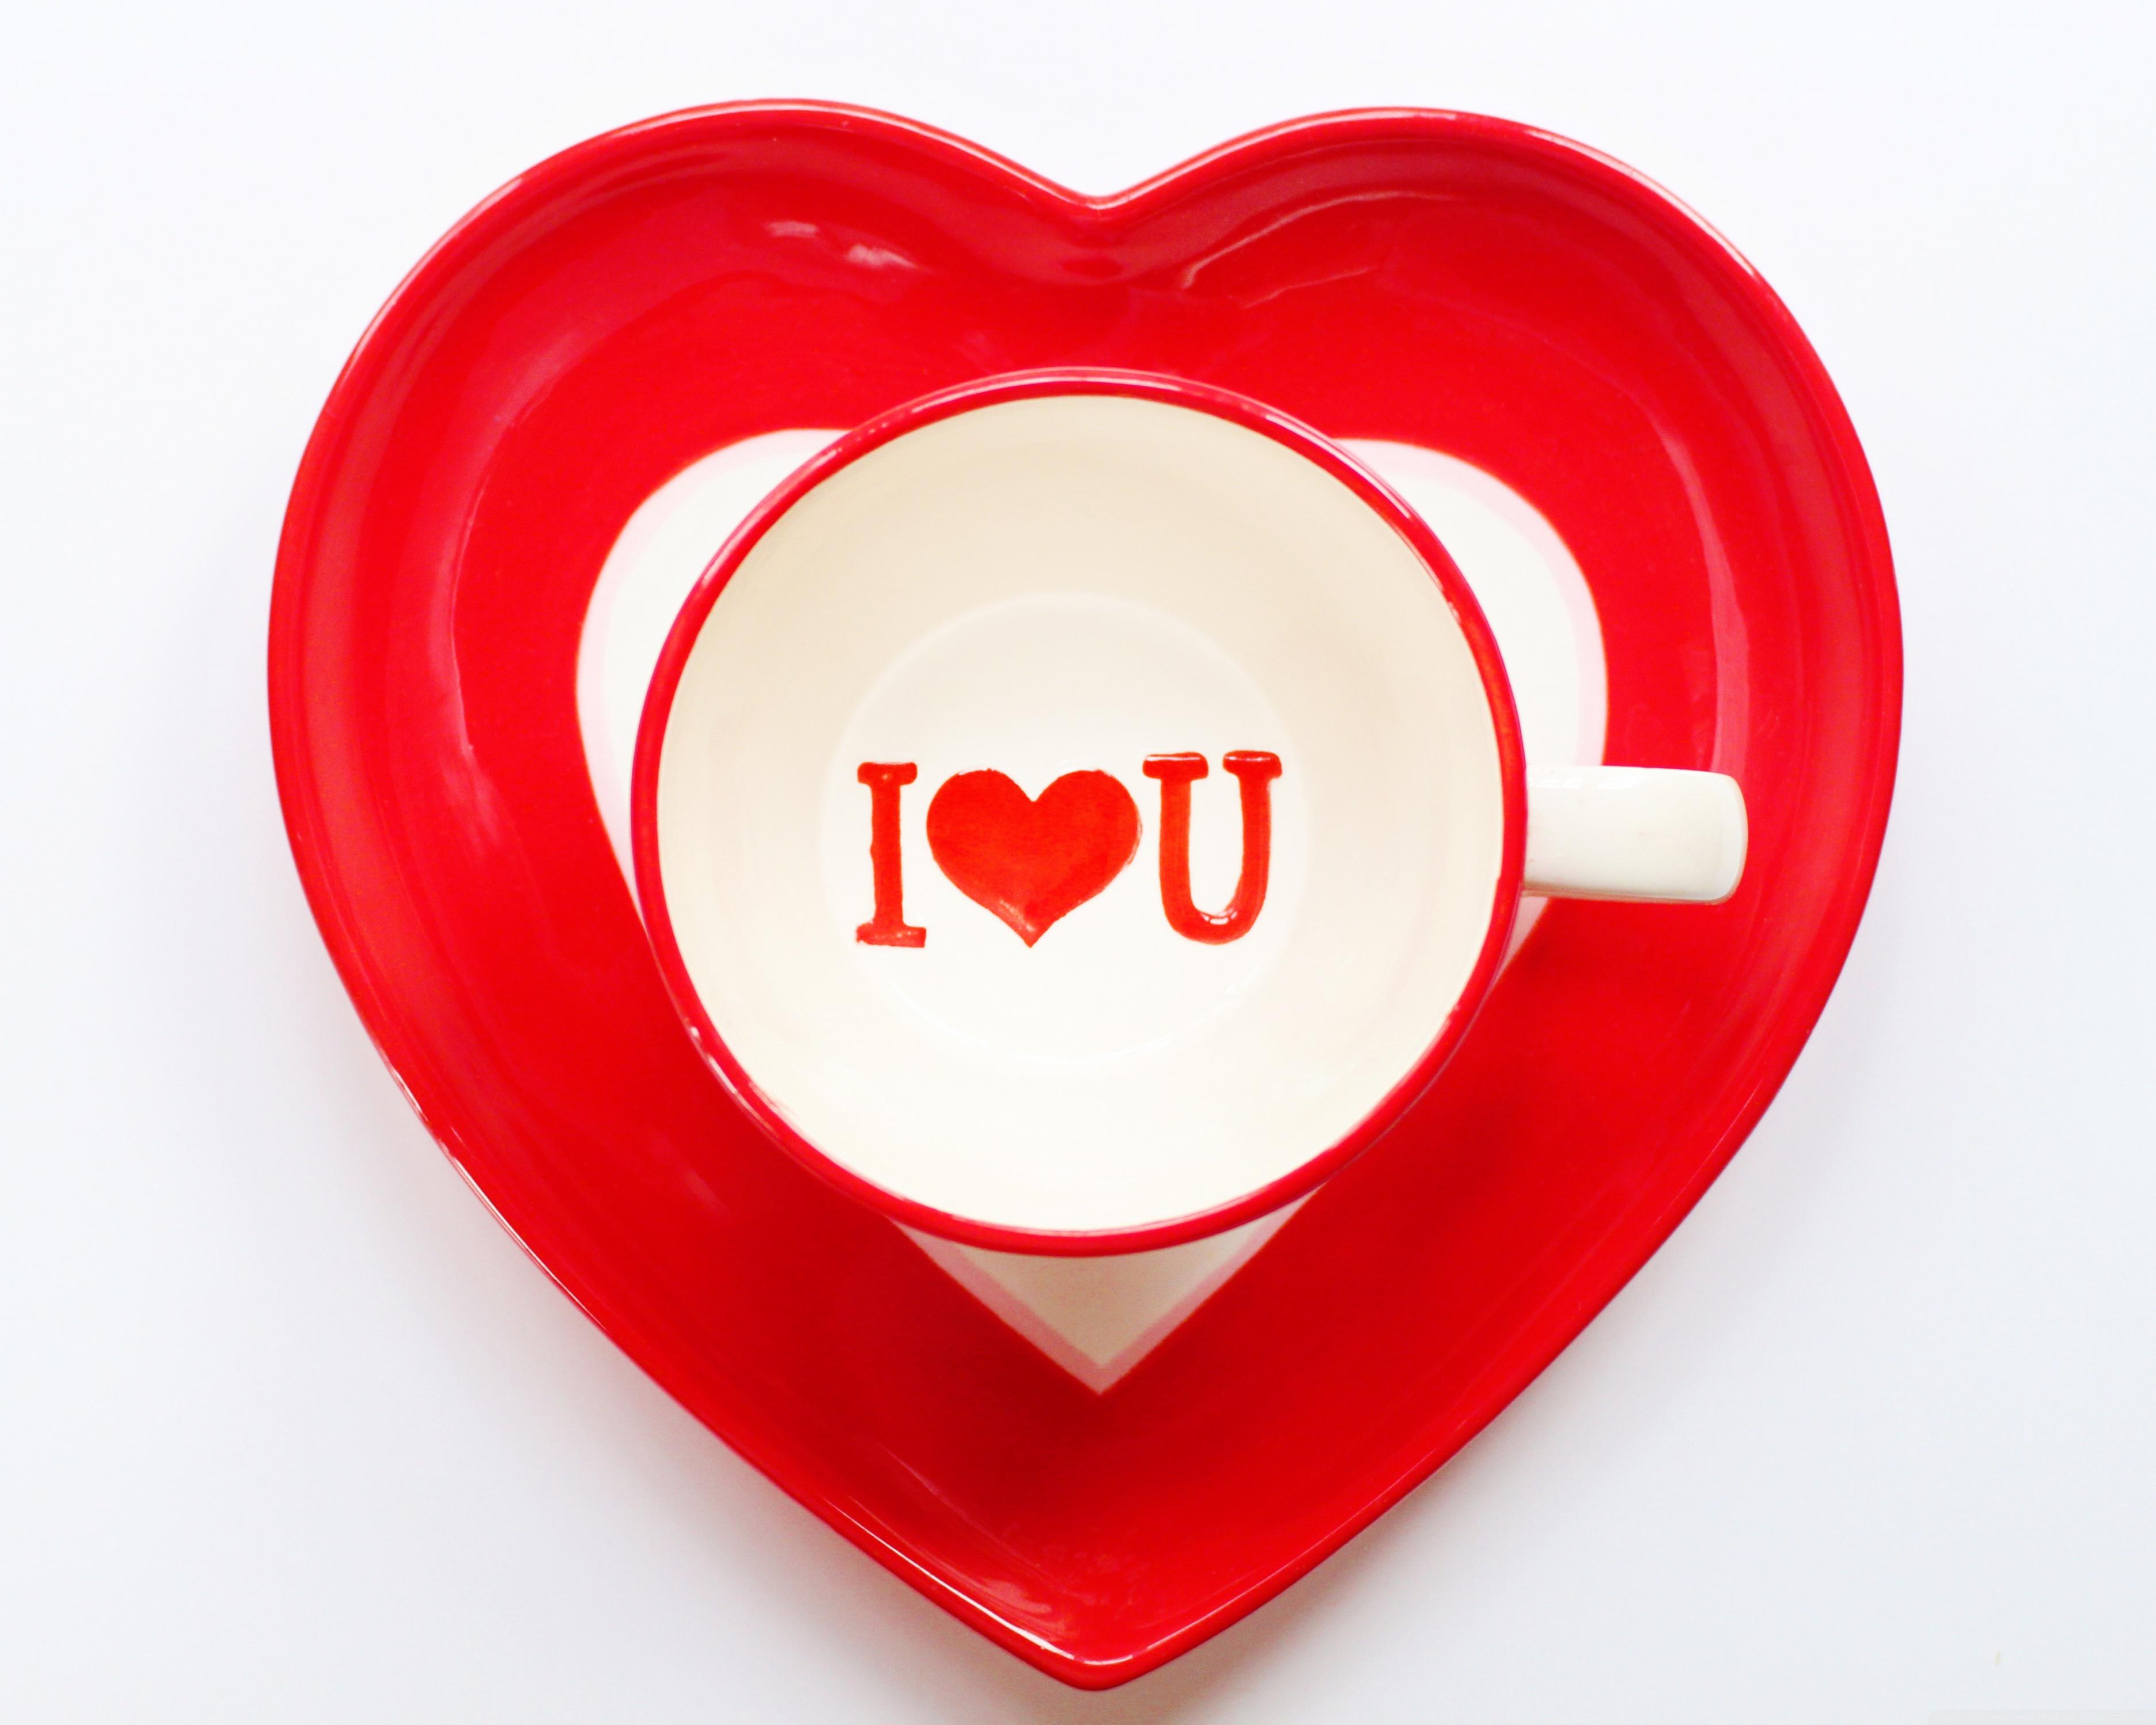 love wallpaper,red,heart,love,organ,valentine's day